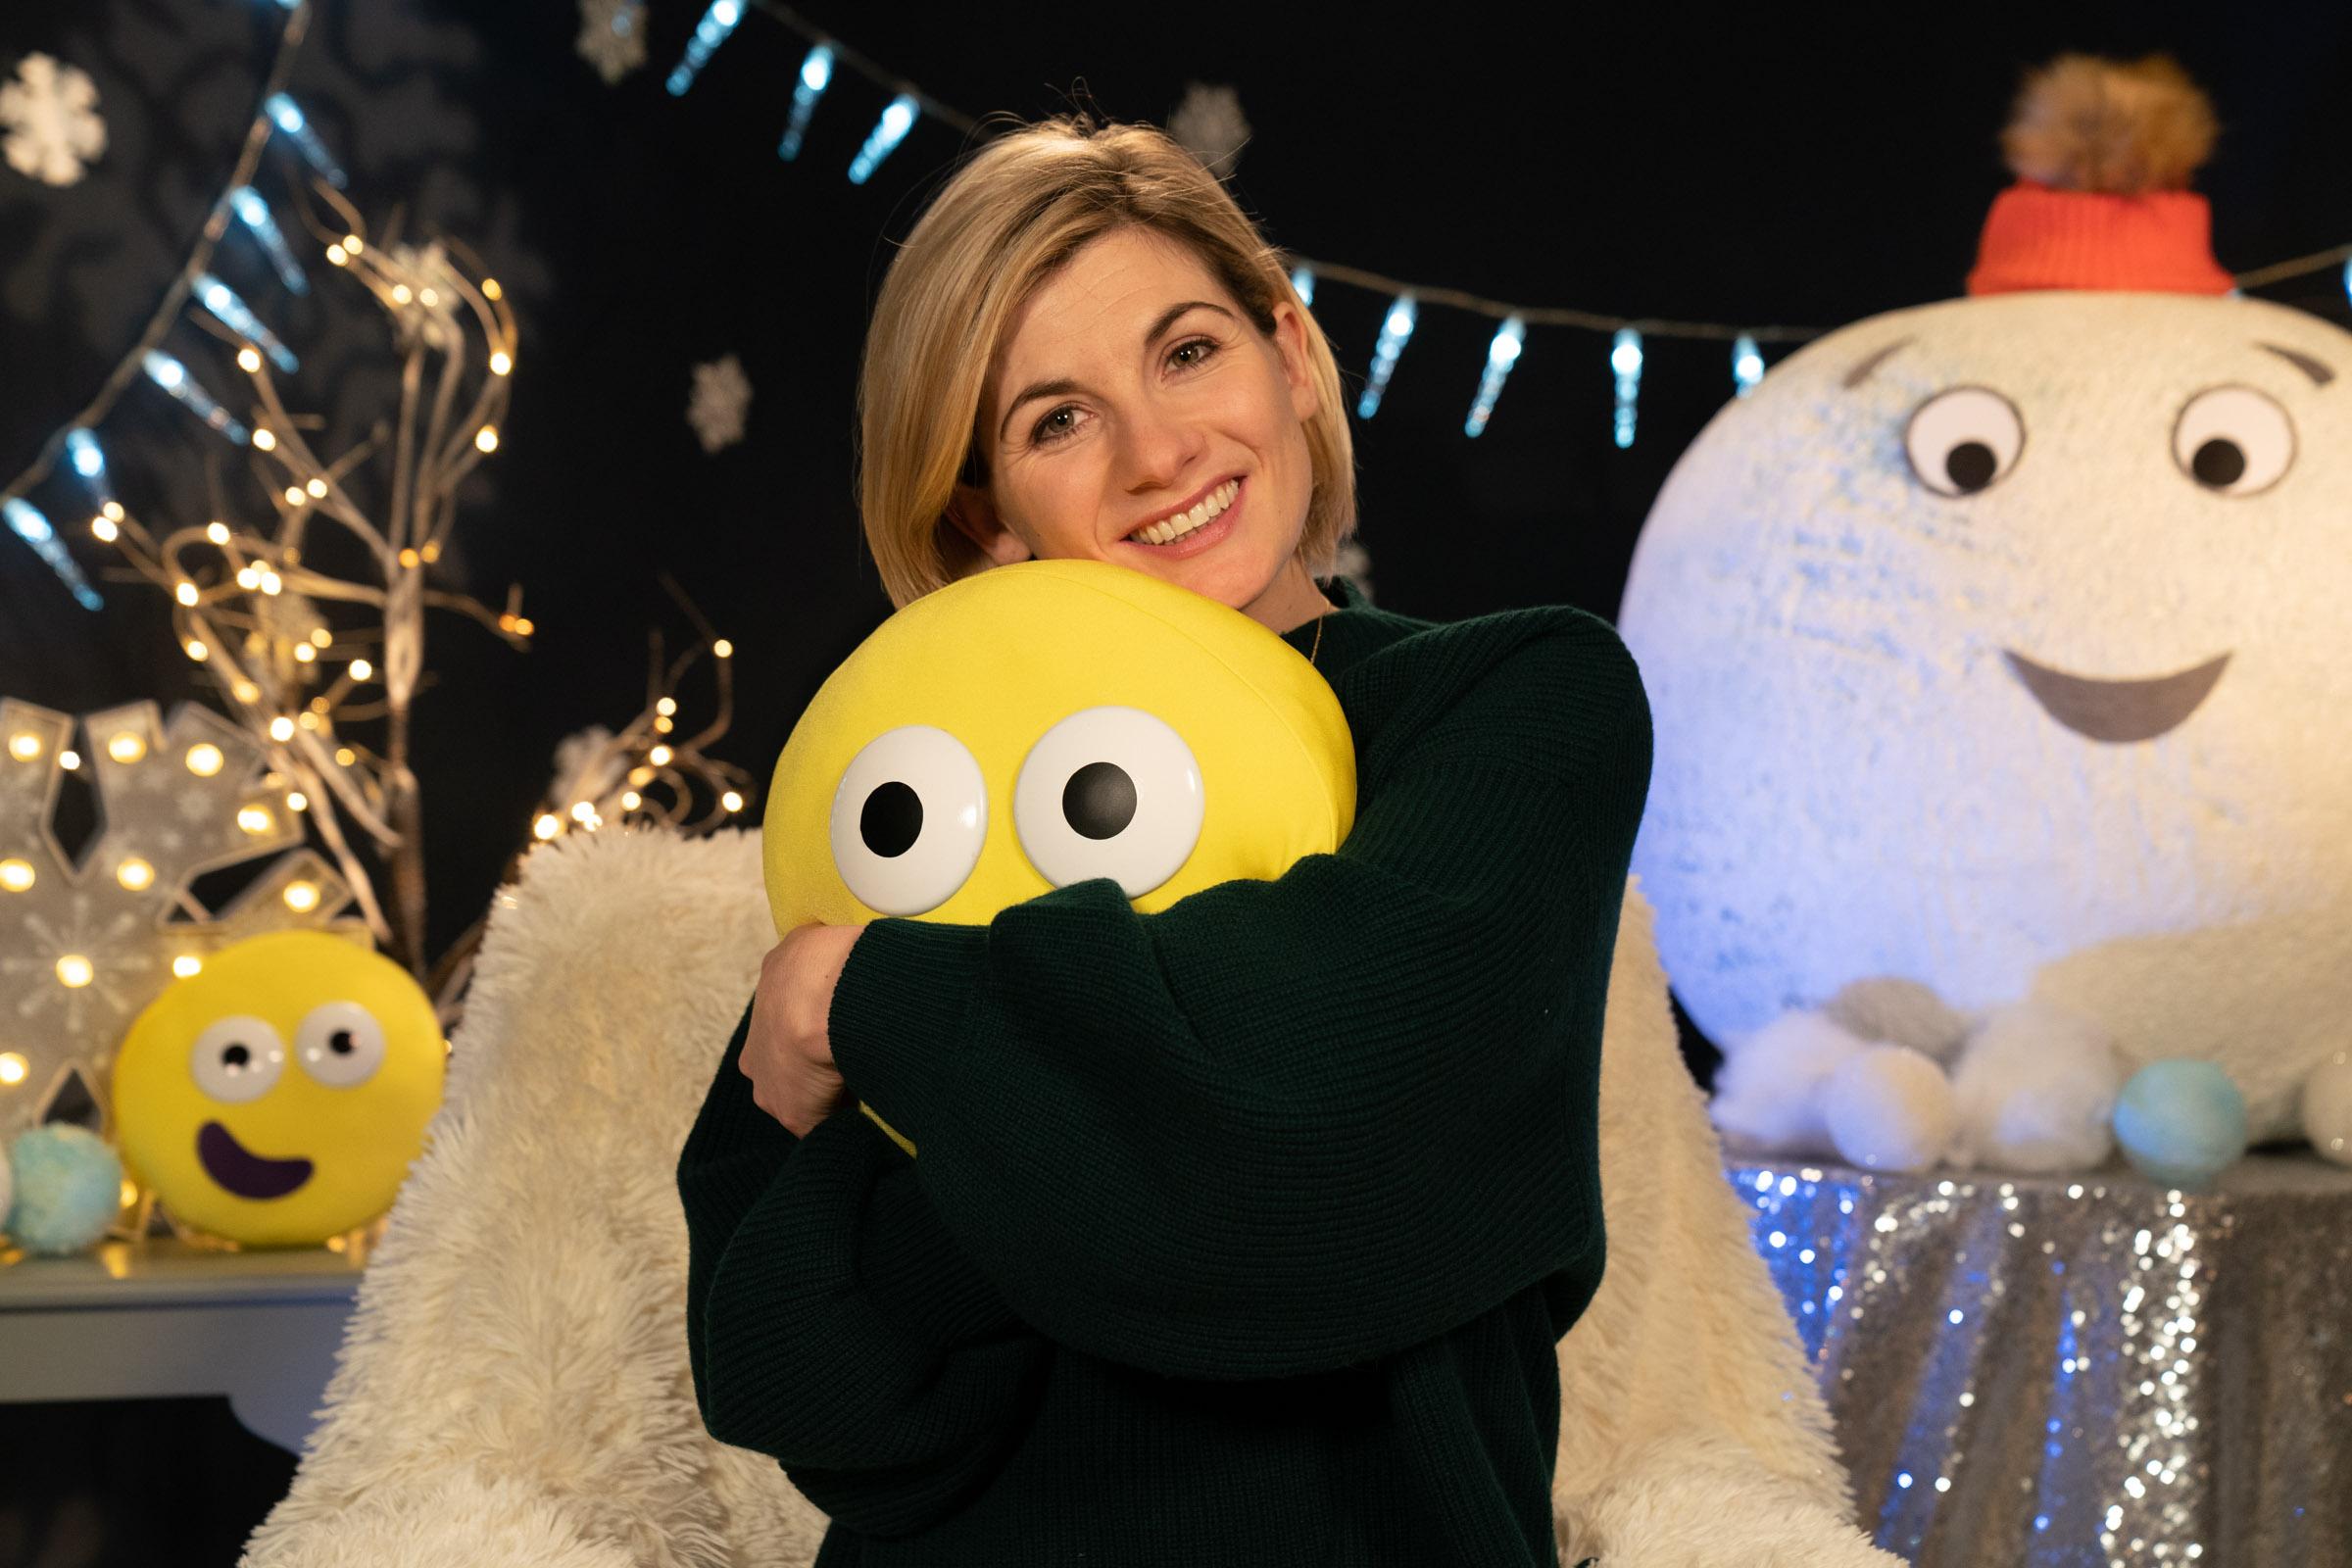 Jodie Whittaker  CBeebies / BBC